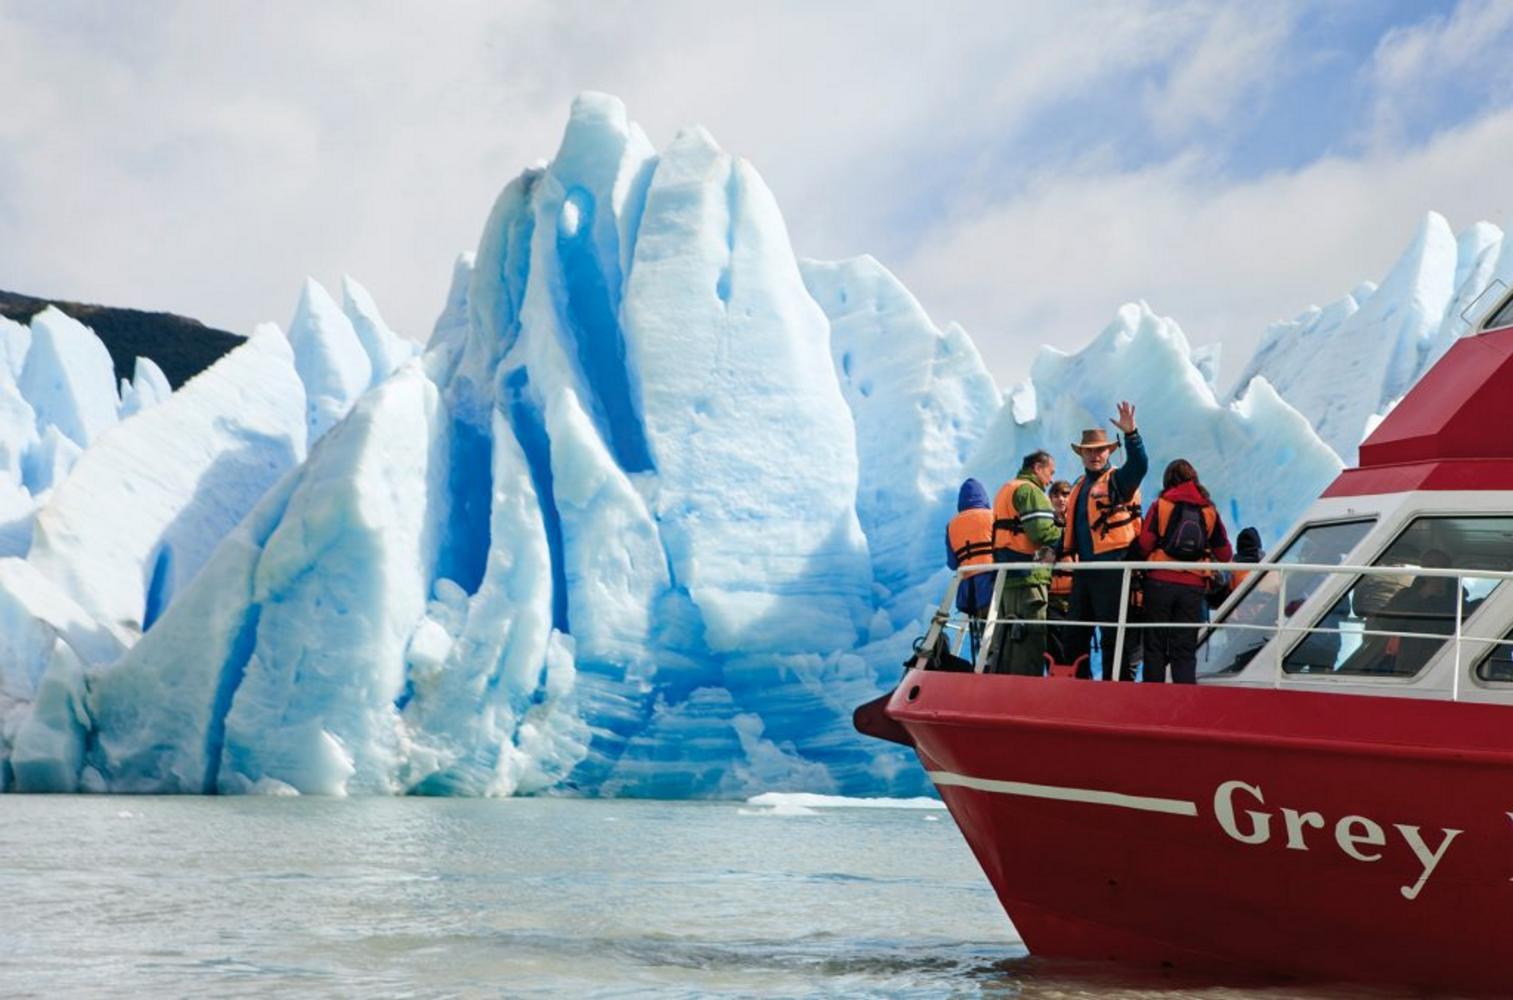 Lake Grey Glacier boat trip